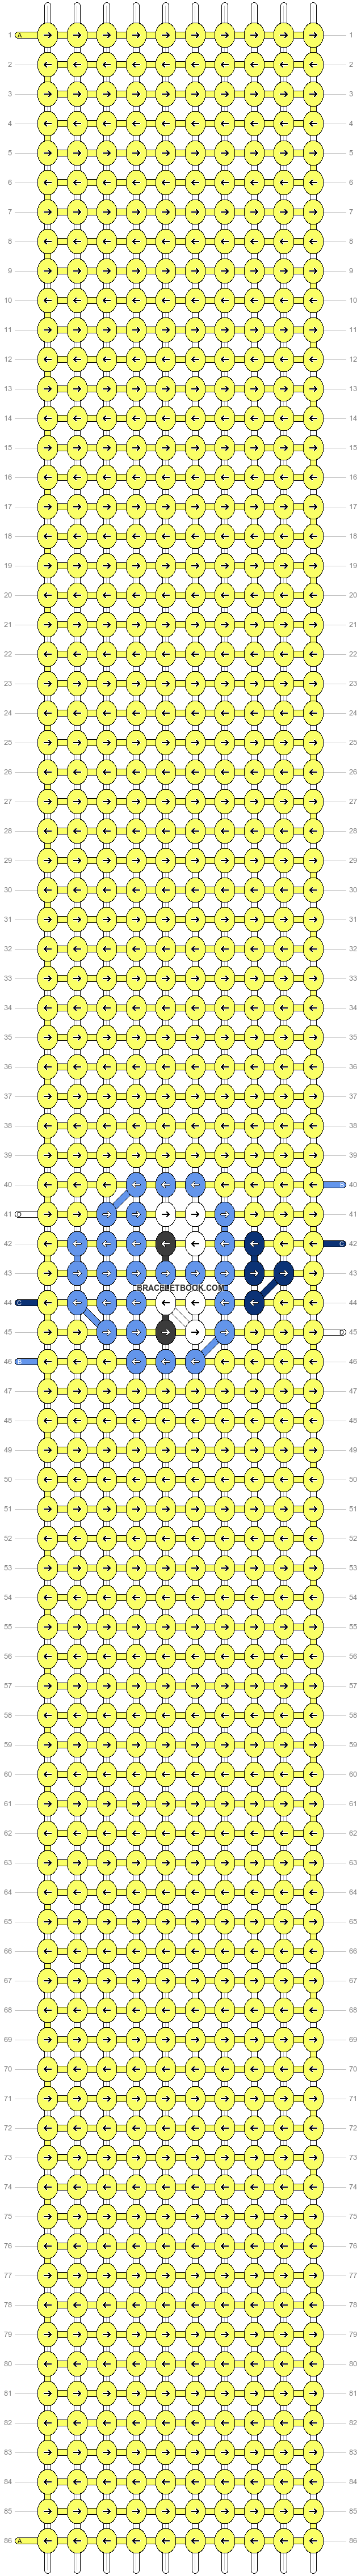 Alpha pattern #54158 pattern